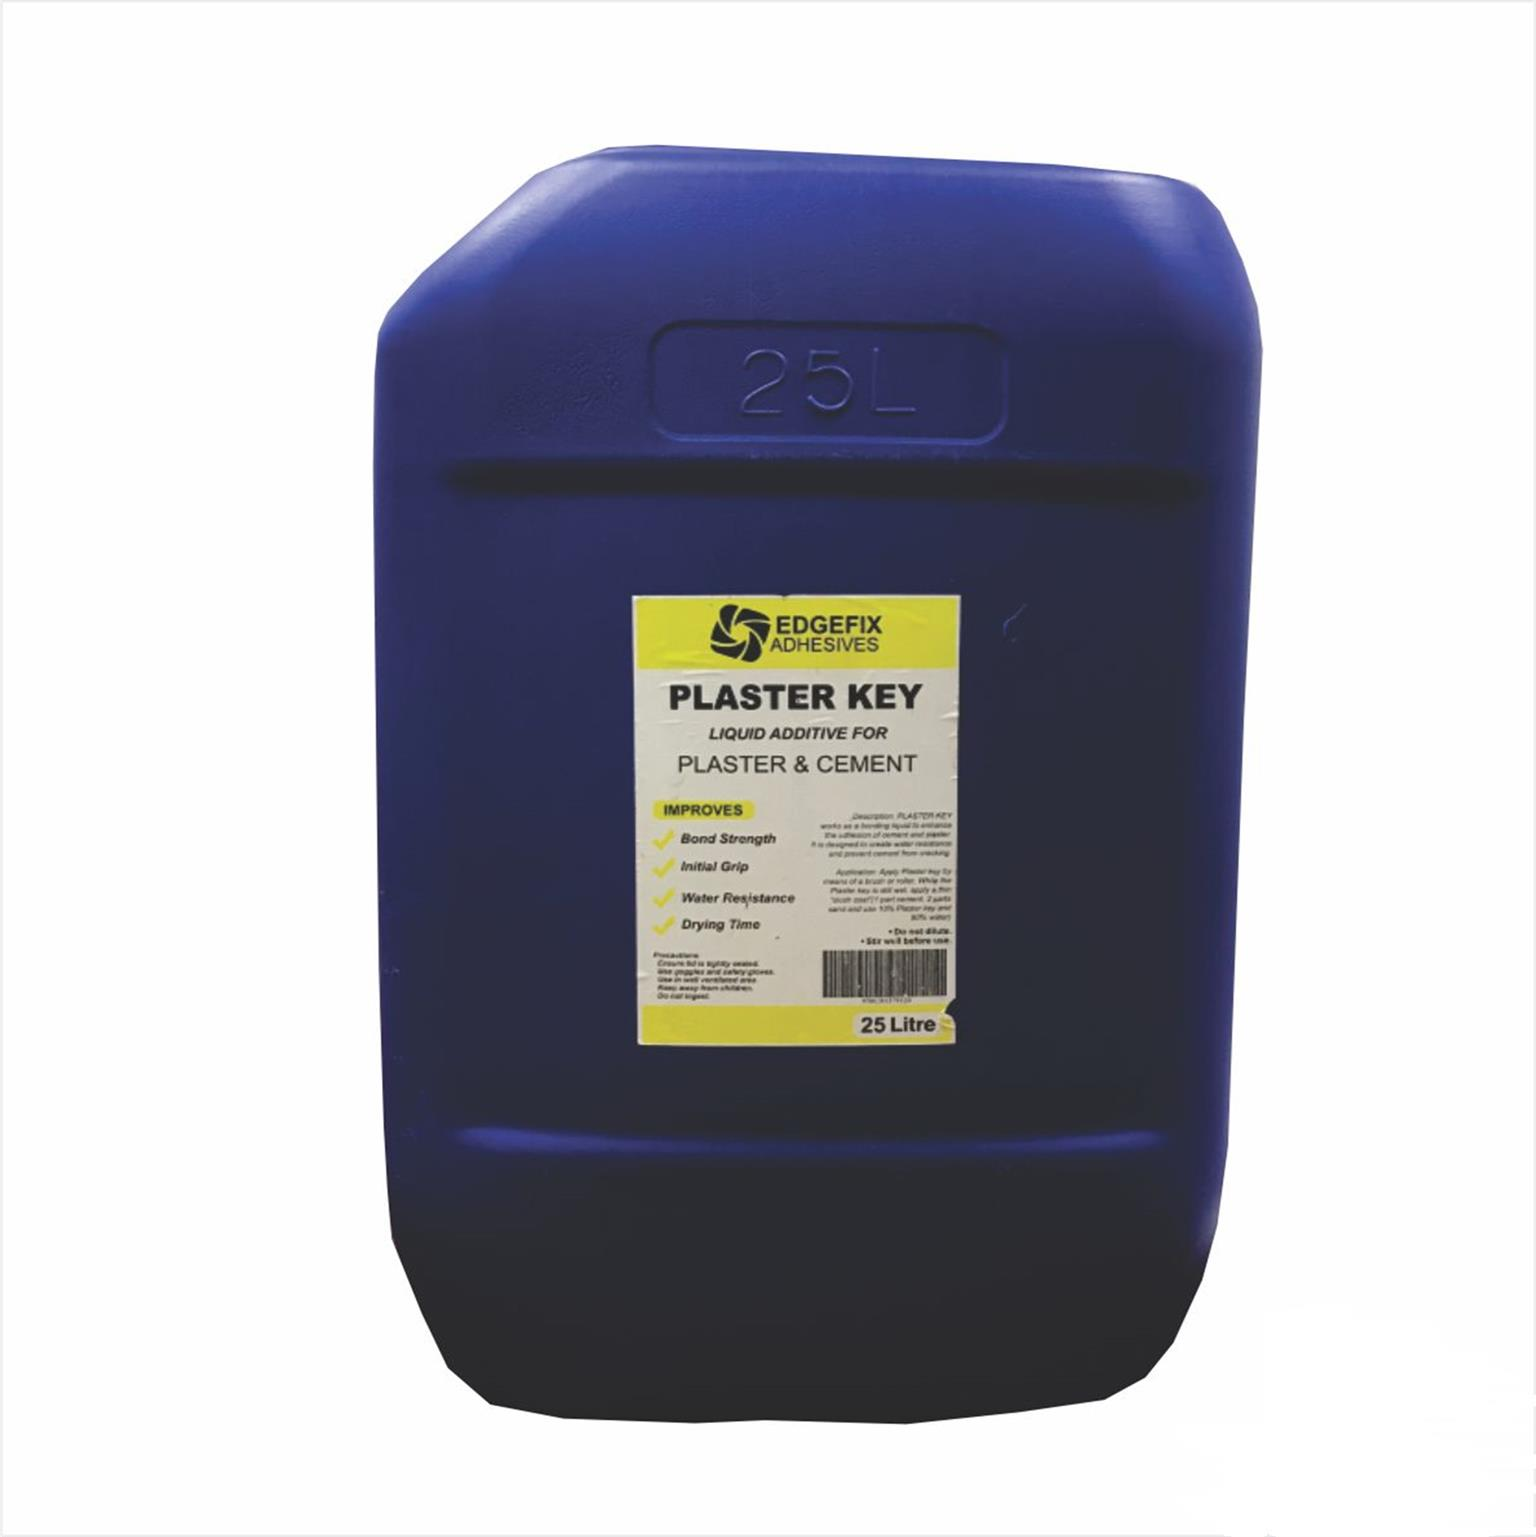 Edgefix Adhesive Plaster Key 25 Litre